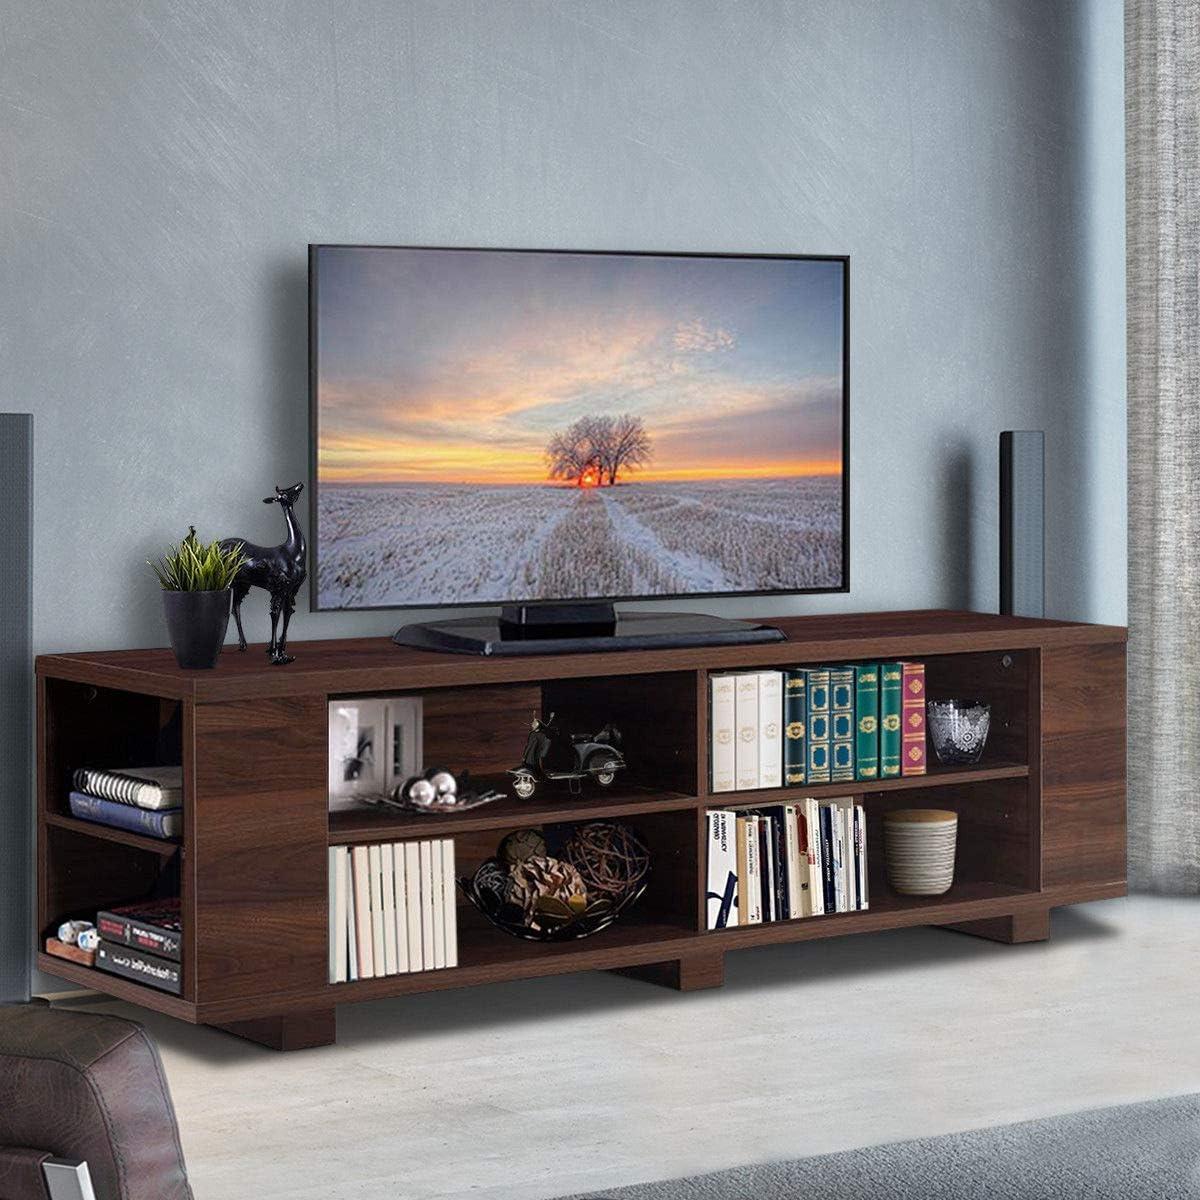 Tangkula Tv Stand Modern For Tvs Up, Living Room Entertainment Center